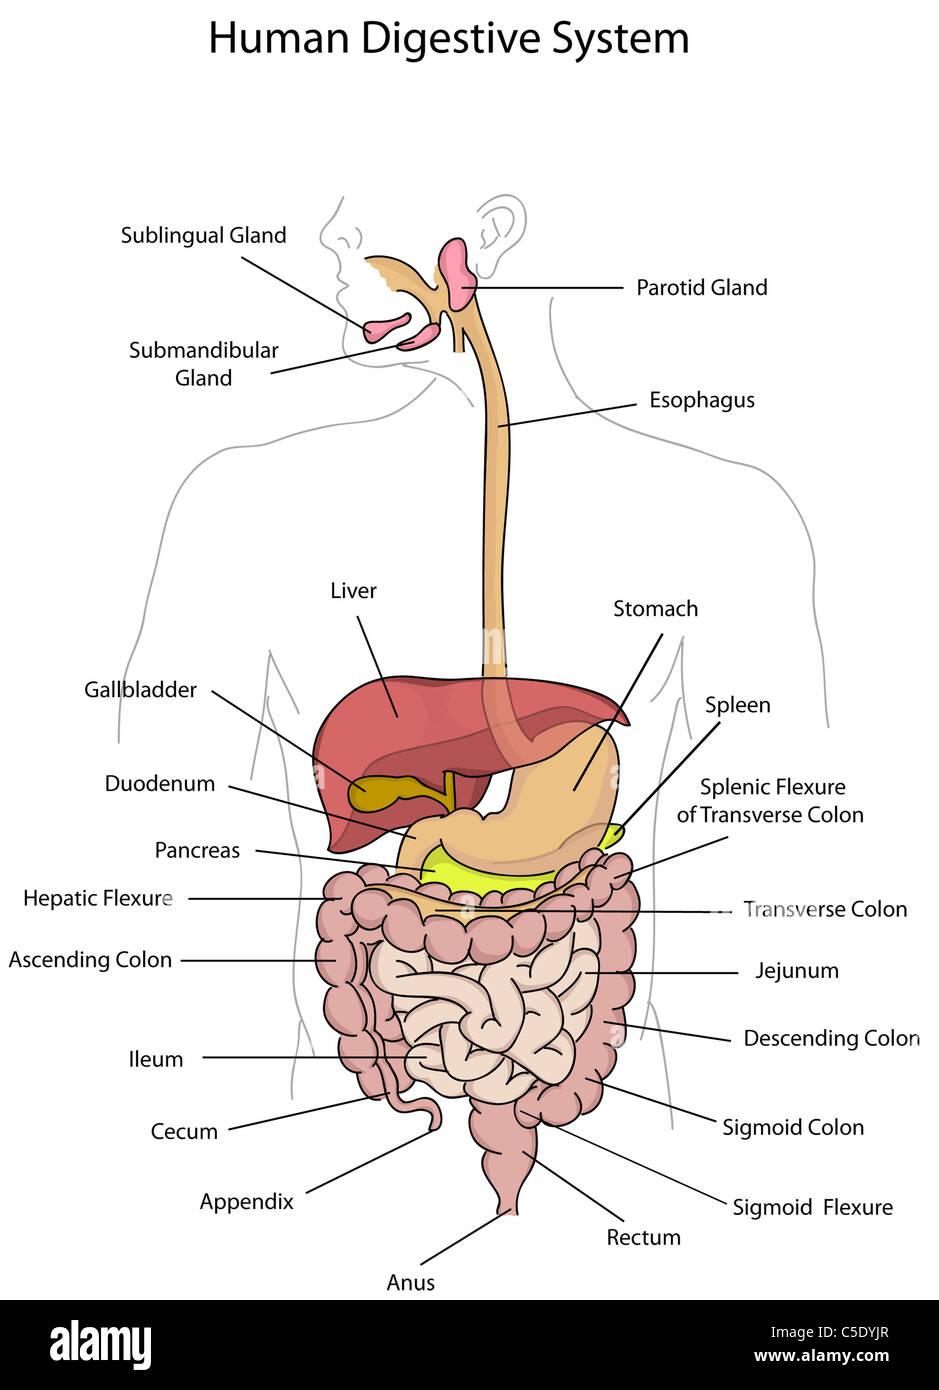 Digestive System Illustration Imágenes De Stock & Digestive System ...